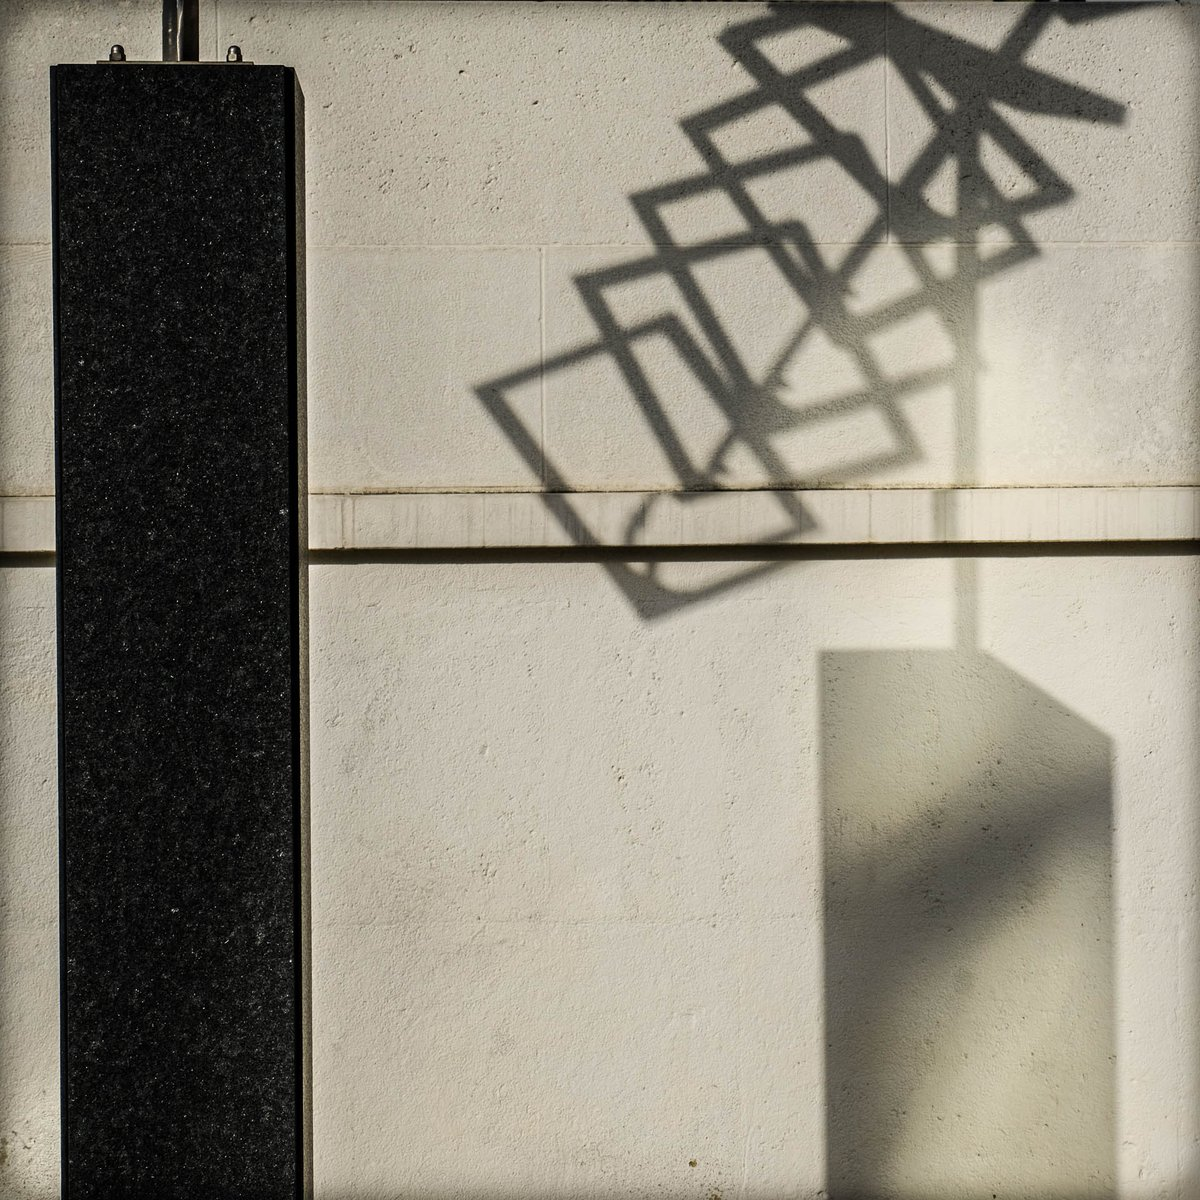 #bobbiandleesphotoadventures with light and shadow in #vienna  #chasinglight #toldwithexposure #minimalist #minimalism #minimal_shots #fujixt3   #velvia  #fujifilm #fujifilmus  #fujifilmx_us #myfujifilmlegacy #artphotography #fineartphotography #ihavethisthingwithshadowspic.twitter.com/US0ILtBTkj